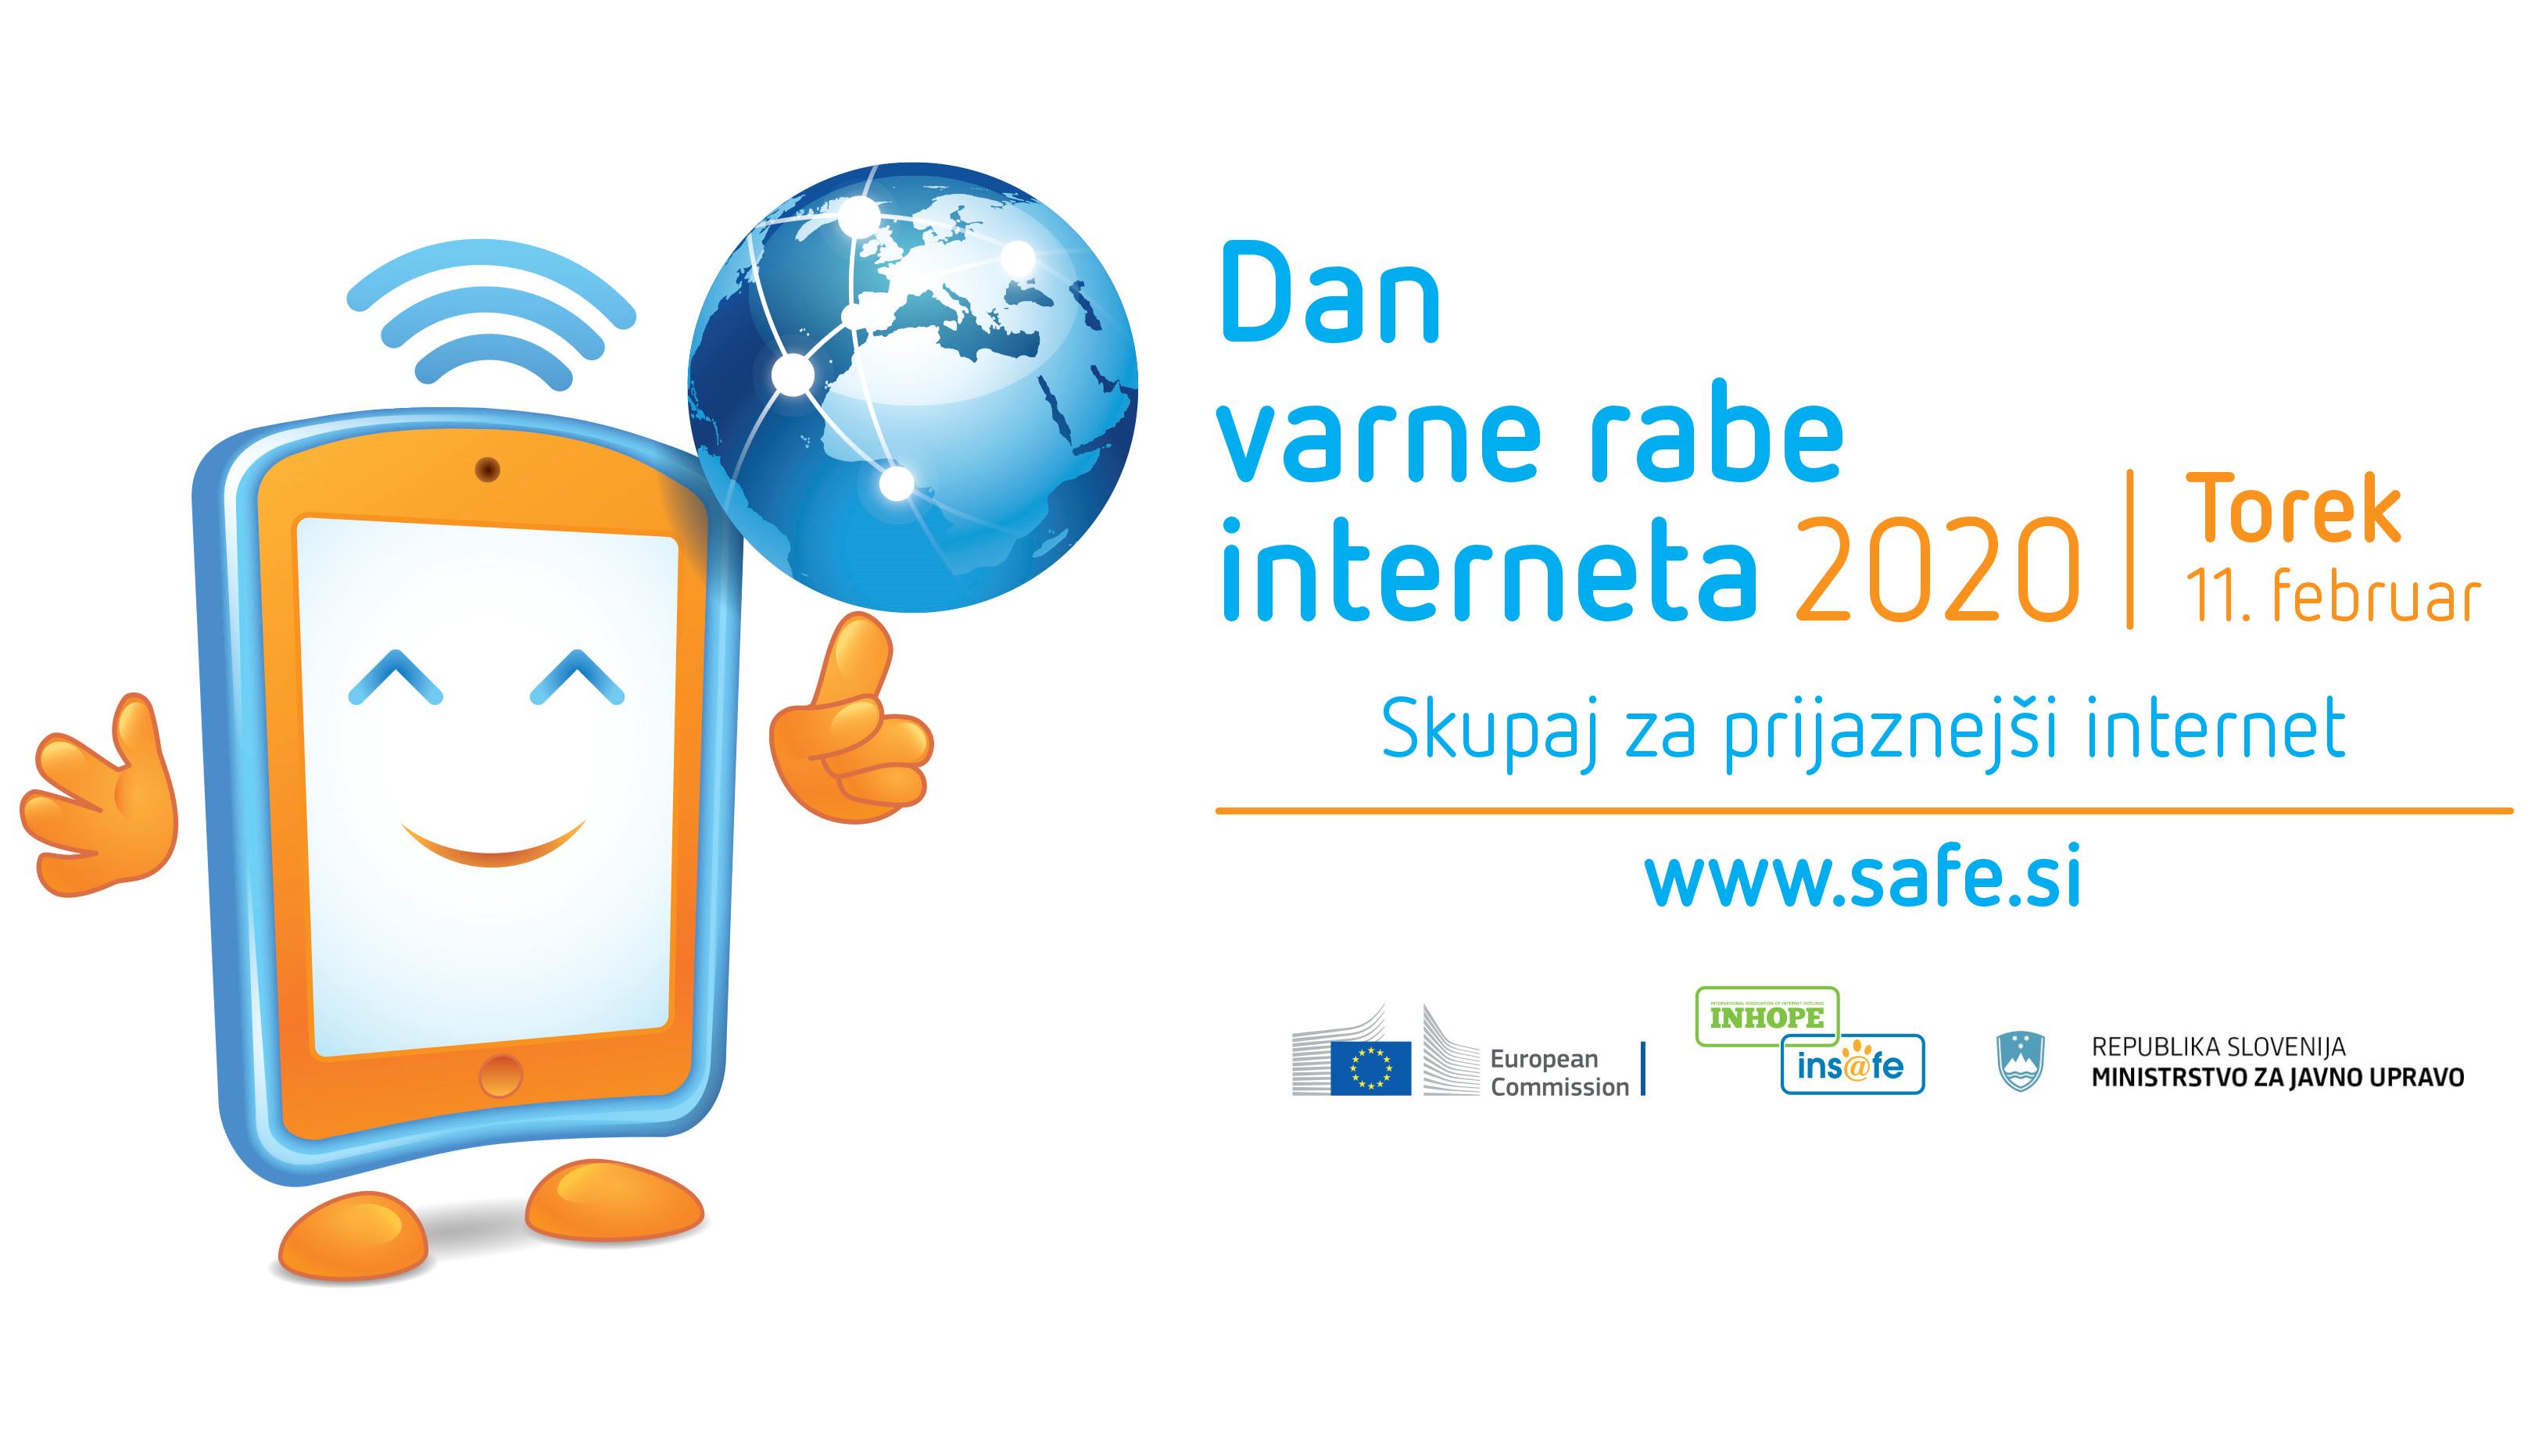 Dan varne rabe interneta – 11. februar 2020